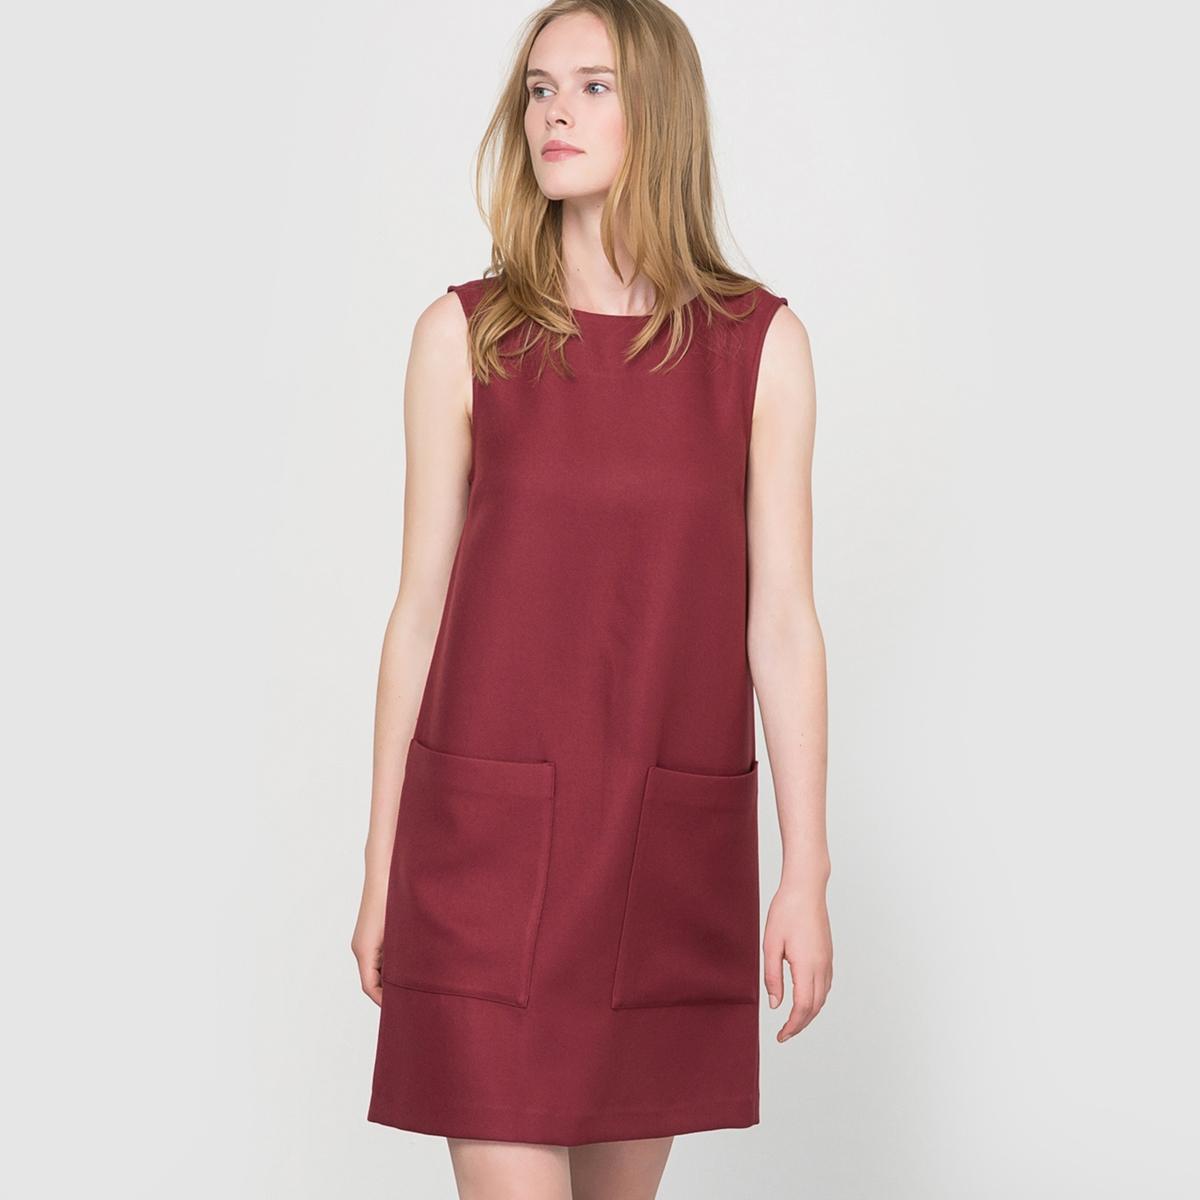 Платье без рукавов, Made in France la la land in concert stockholm